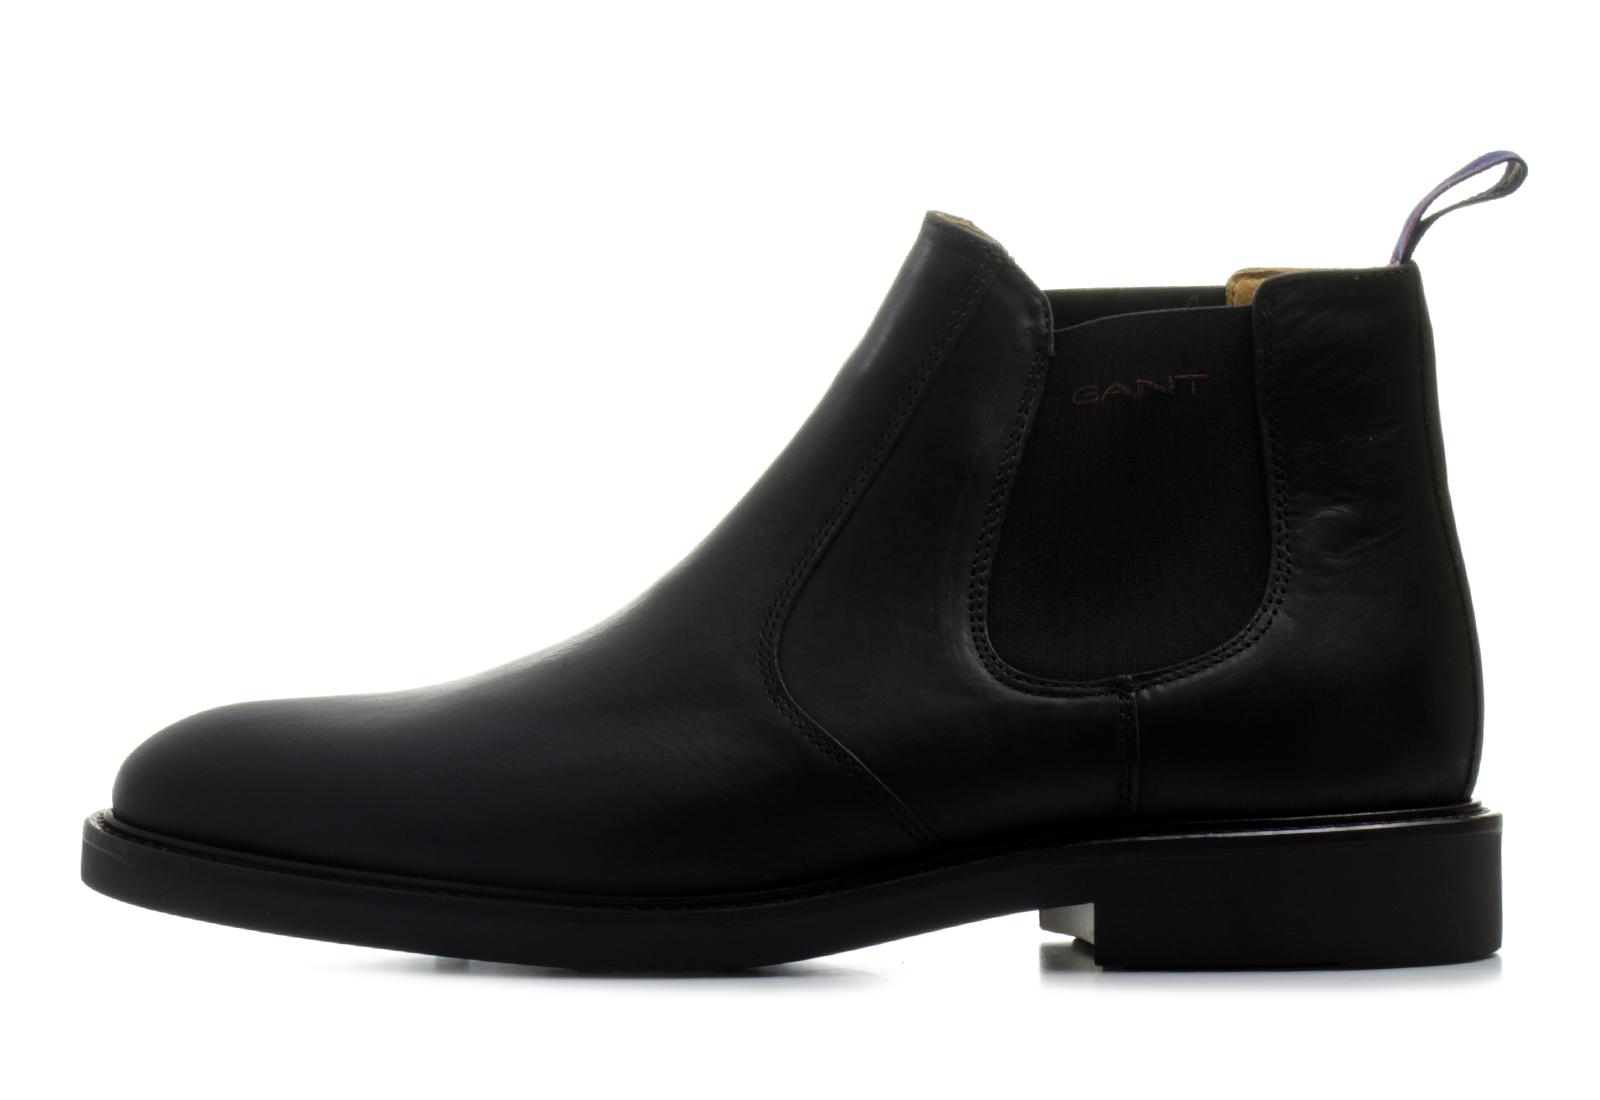 Gant Cipő - Spencer Chelsea - 15651083-G00 - Office Shoes Magyarország 351f46ffd8